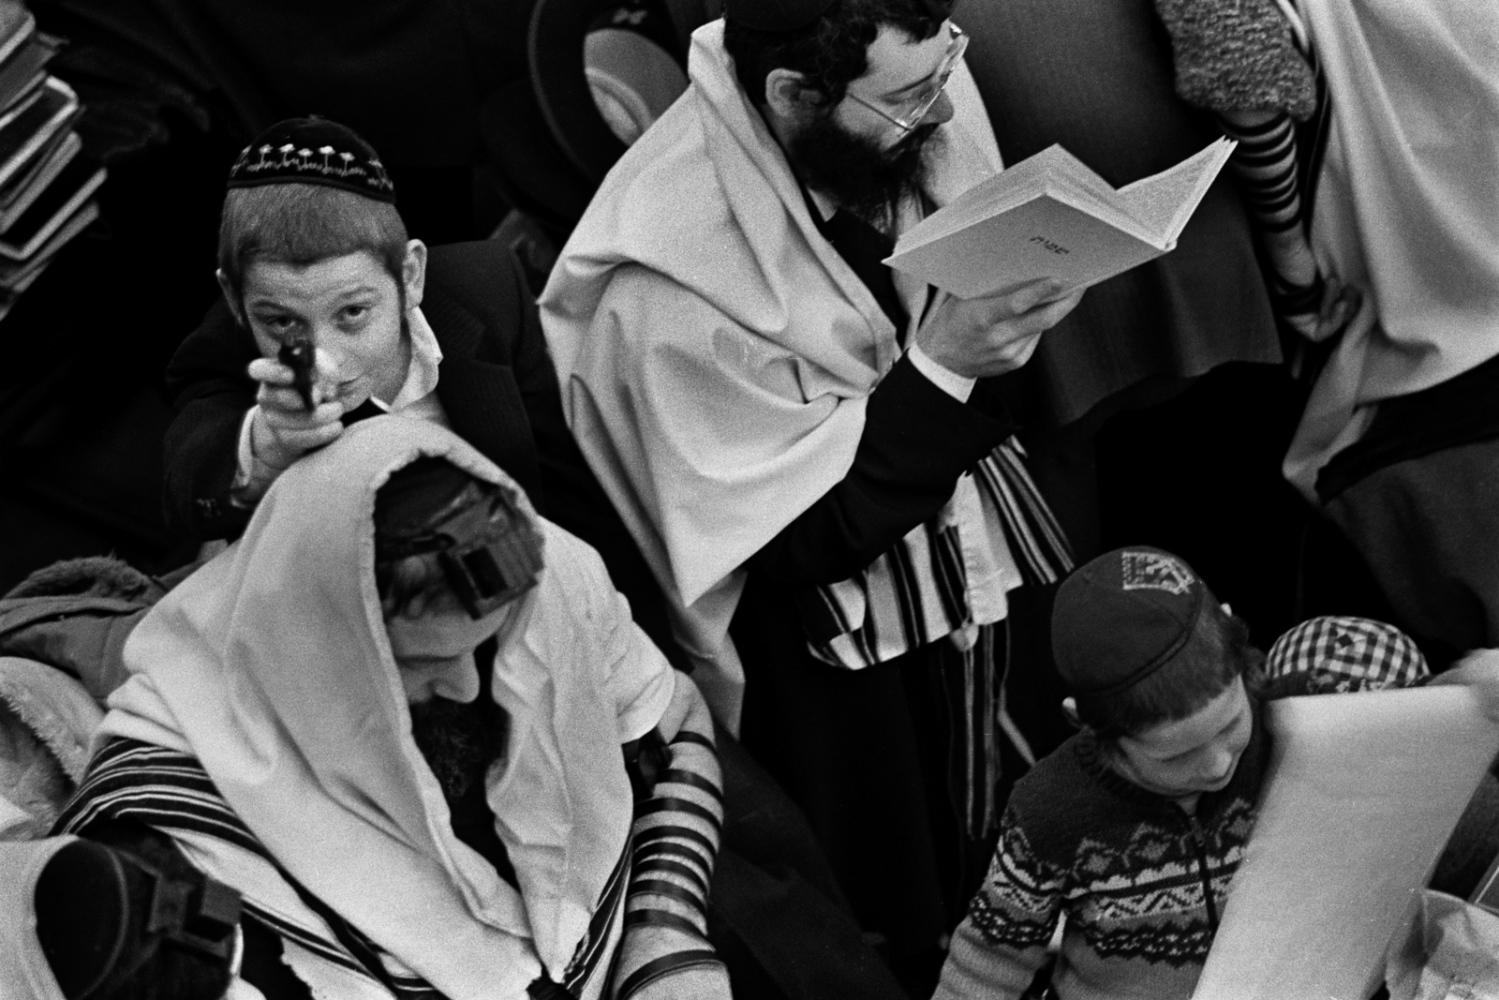 Purim. Crown Heights synagogue, Brooklyn, 1979